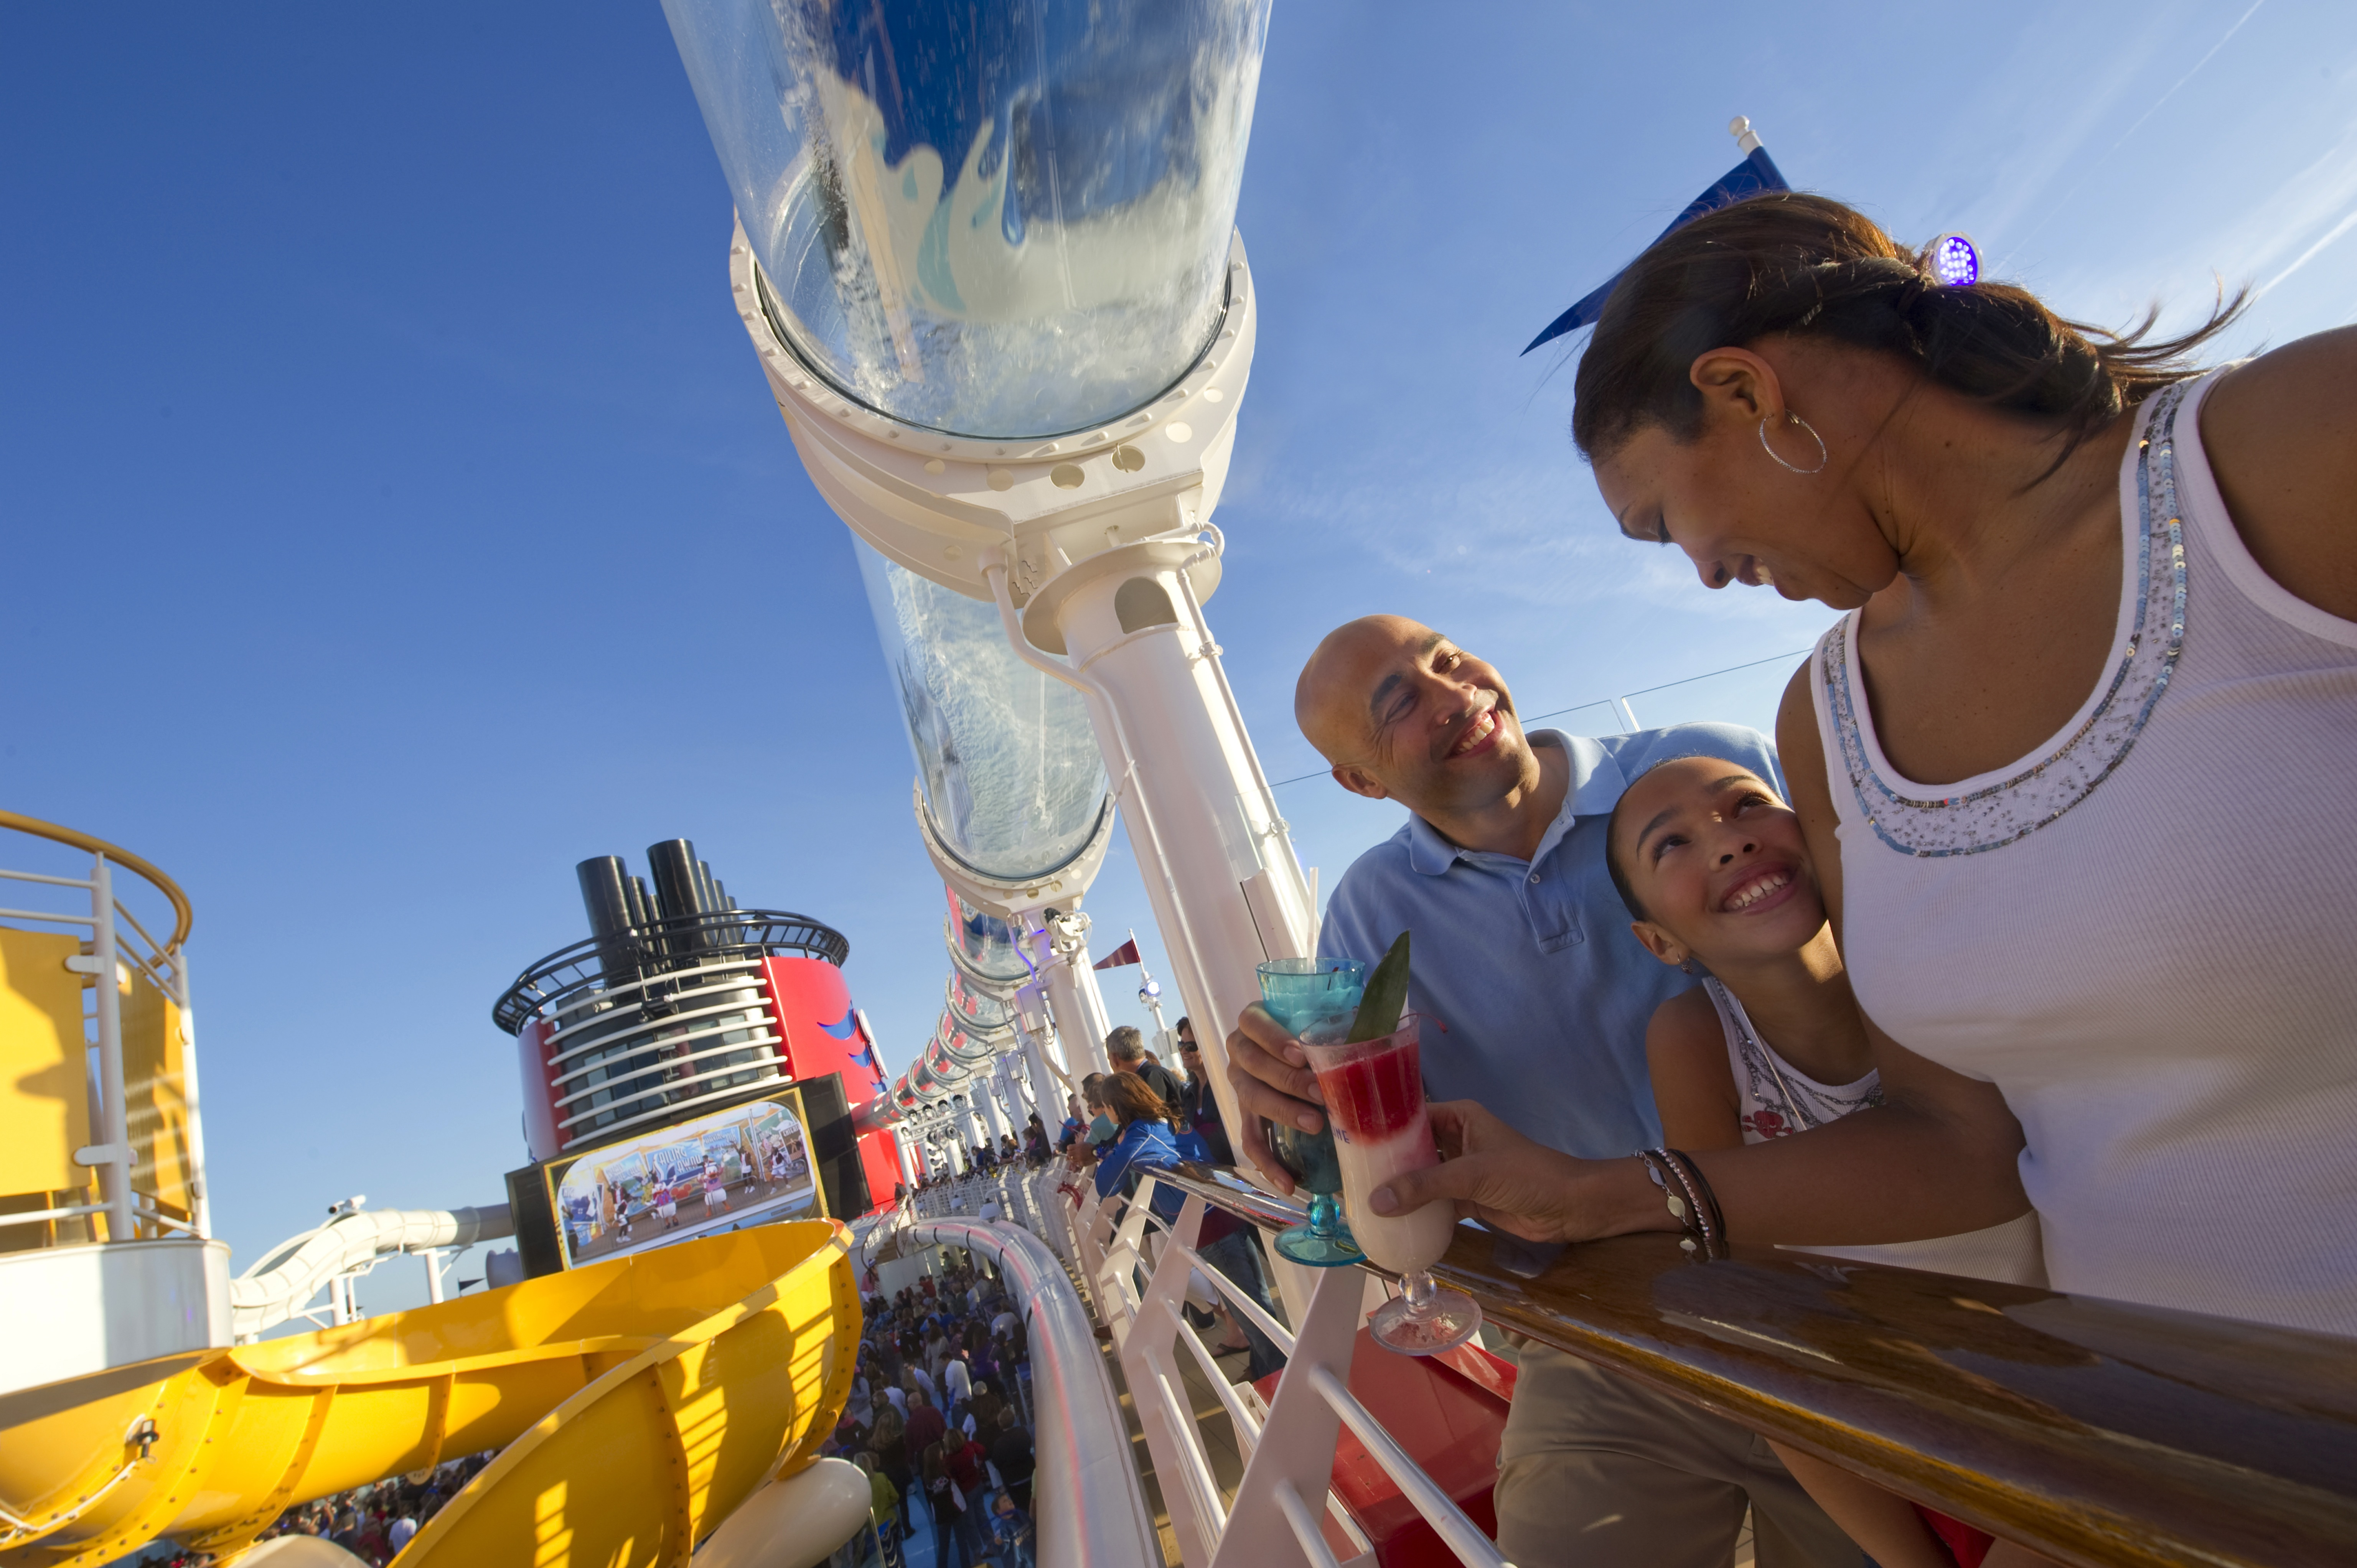 Disney Cruise Line Disney Dream Exterior Family on deck at the Aquaduck.jpg